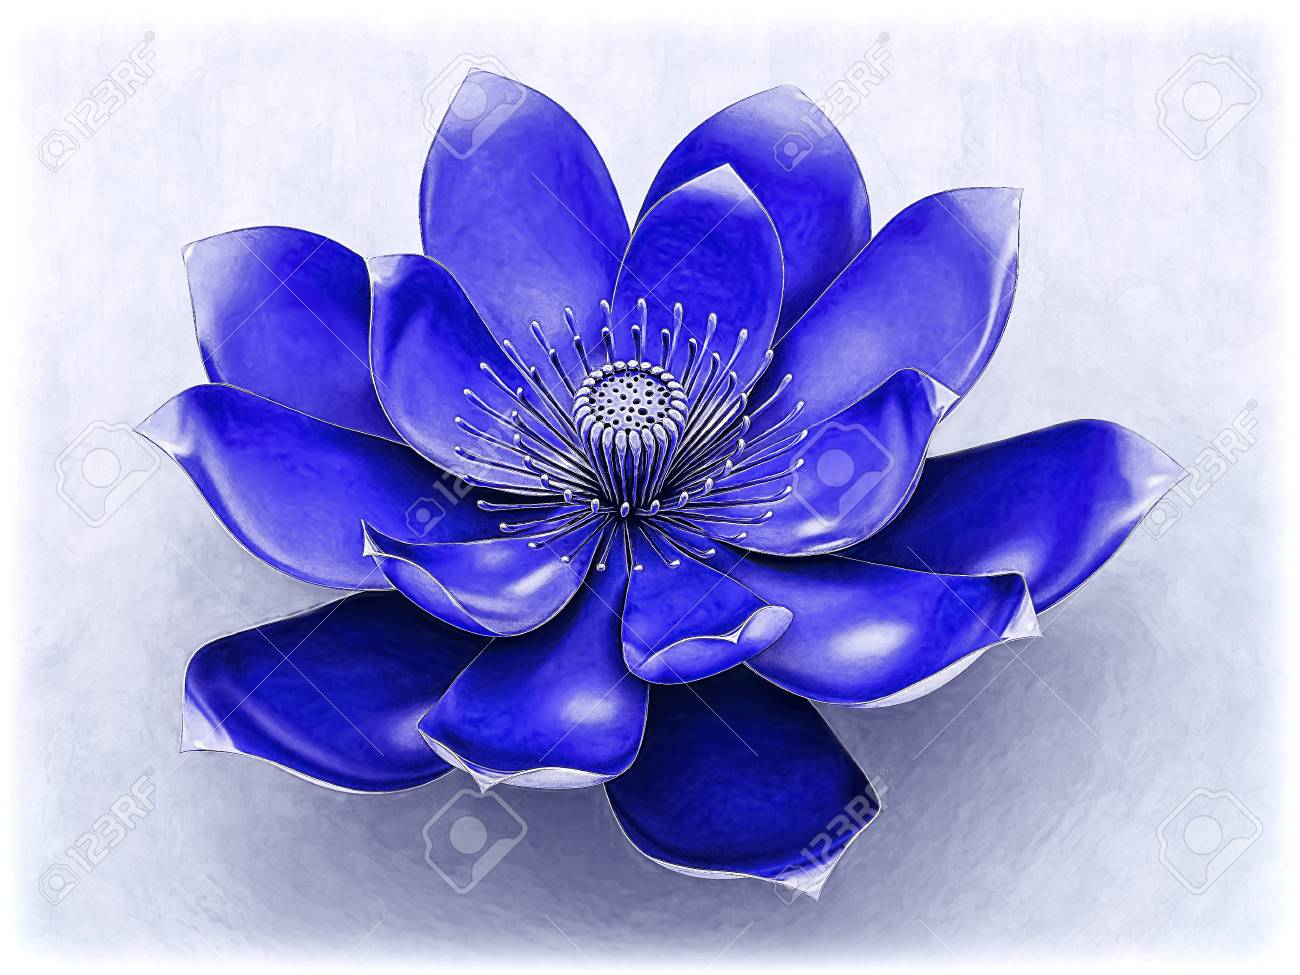 Tempting Chakra Color Indigo Stock Photo Lotus Flower Lotus Flower What Color Is Indigo Henna What Color Is Indigo Black Chakra Color Indigo Stock photos What Color Is Indigo